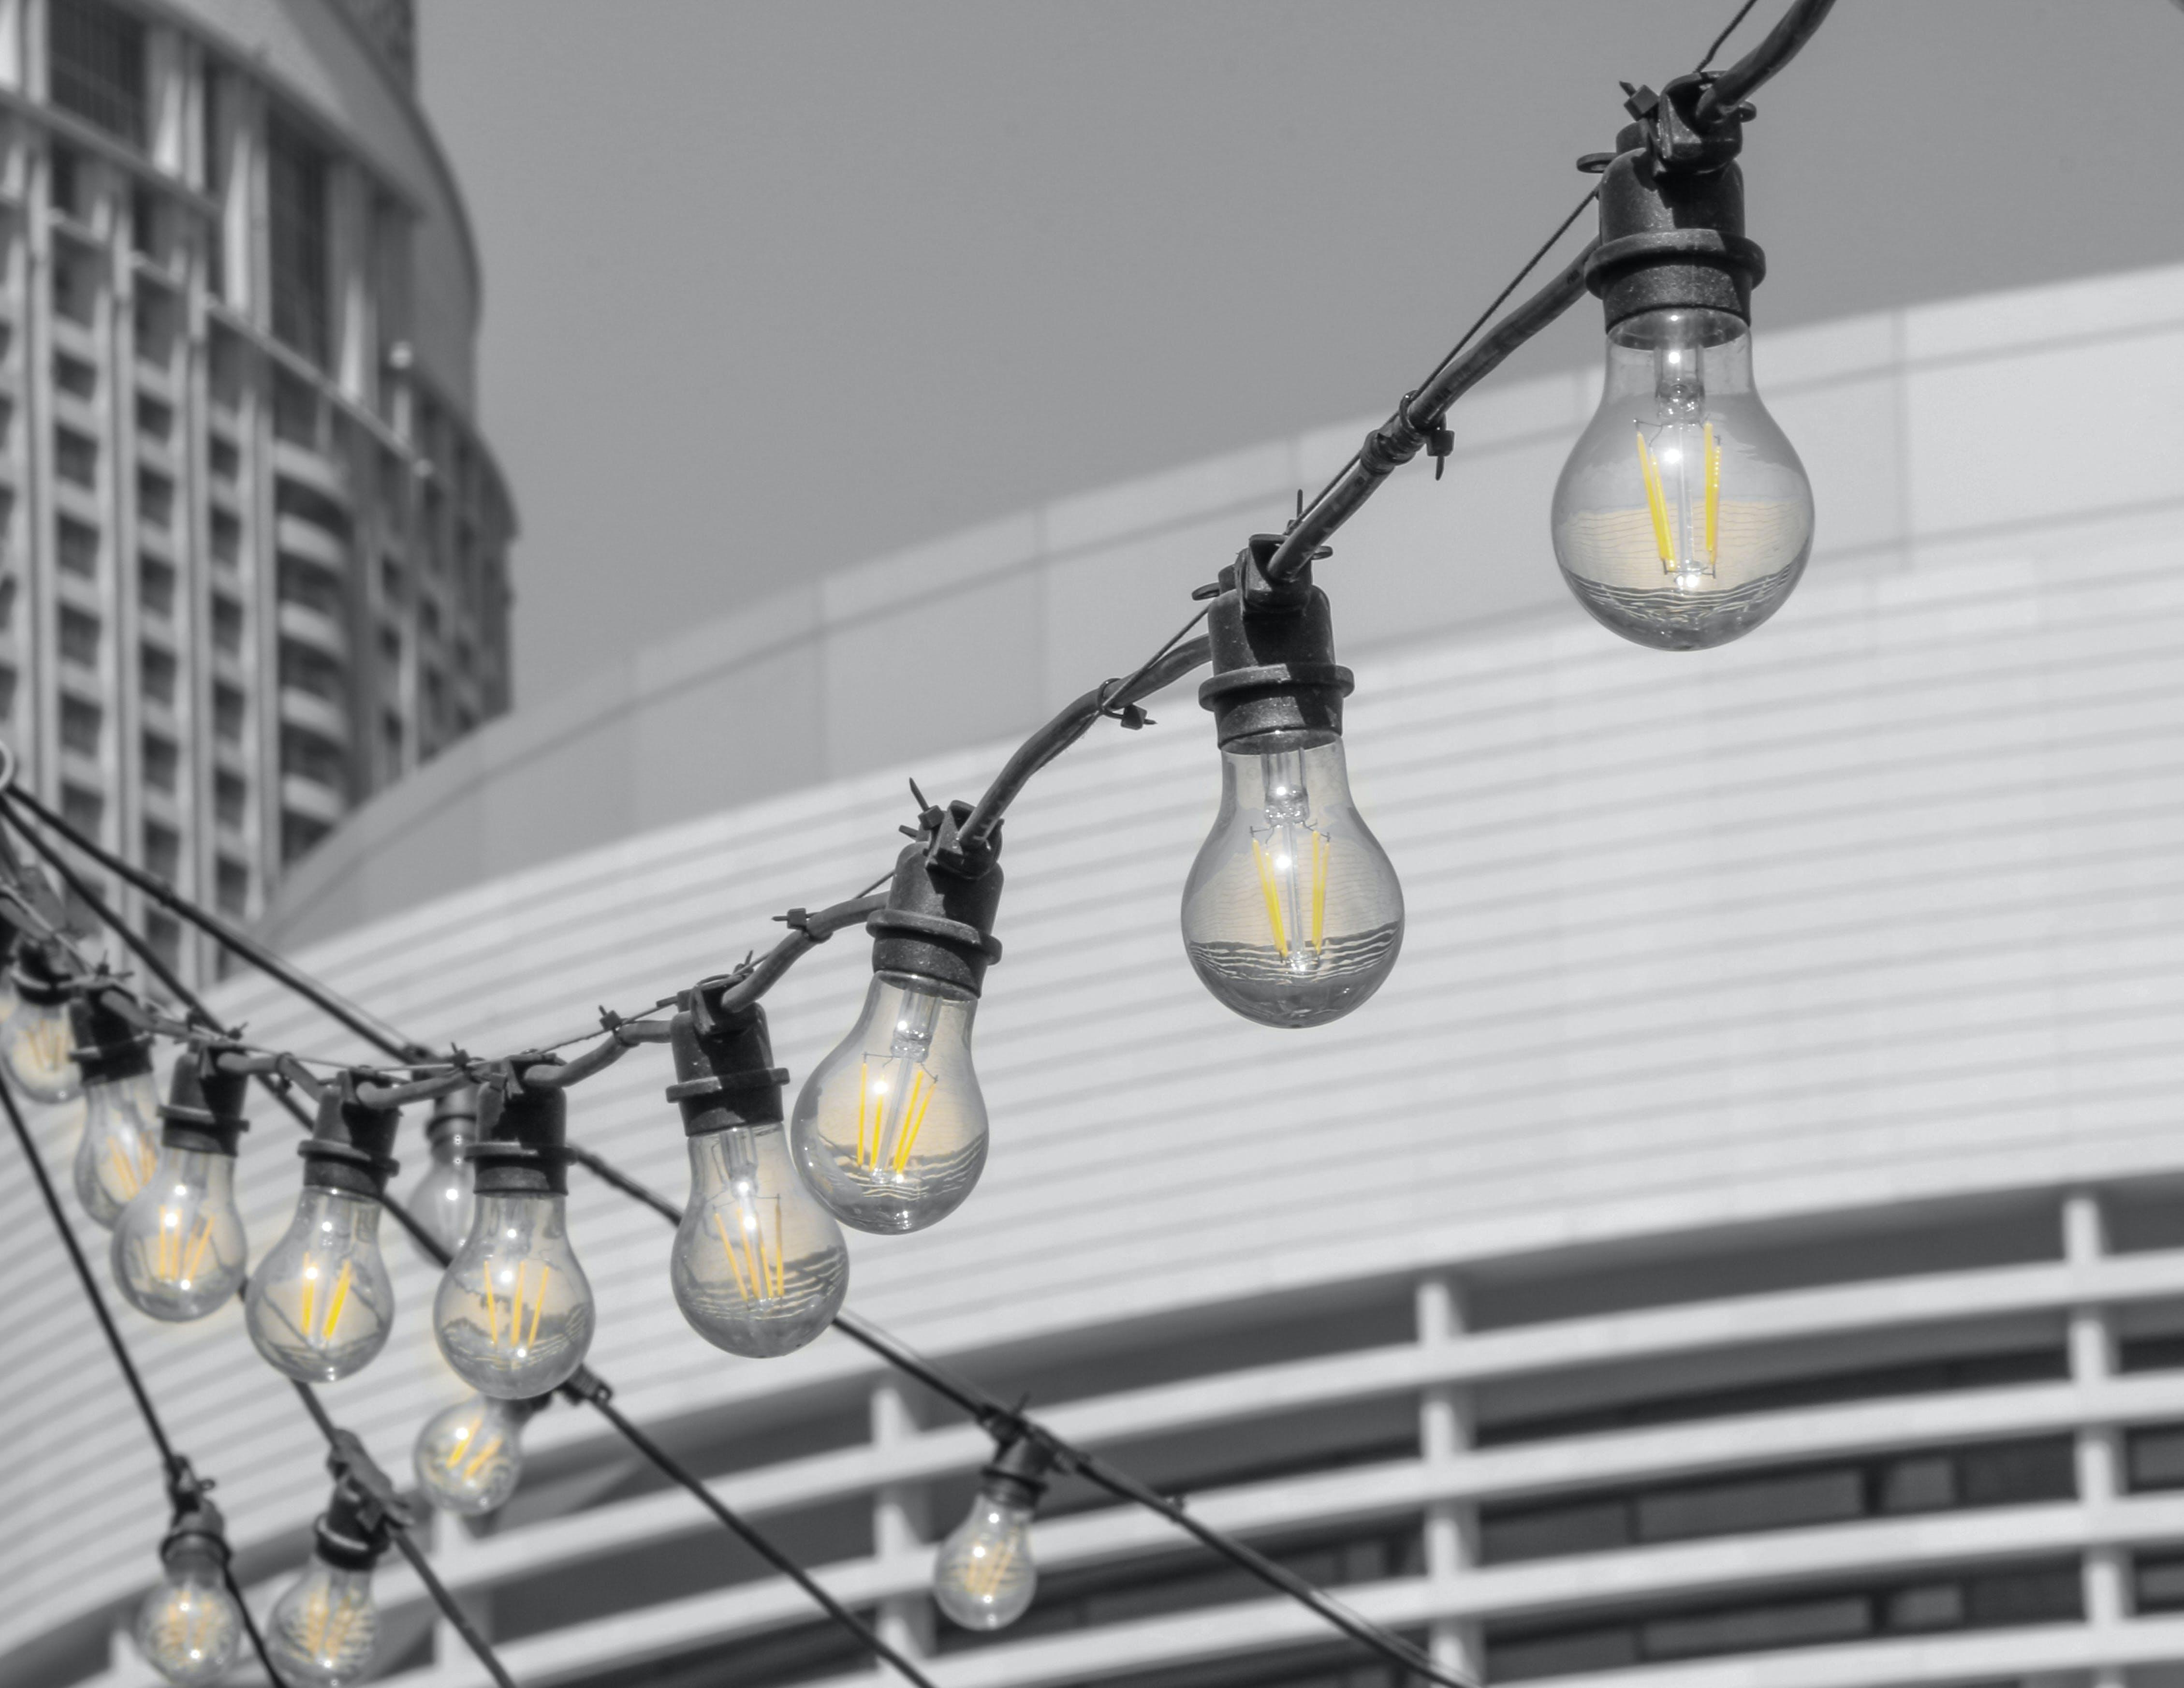 Free stock photo of bulb, bulbs, electric light, light bulb